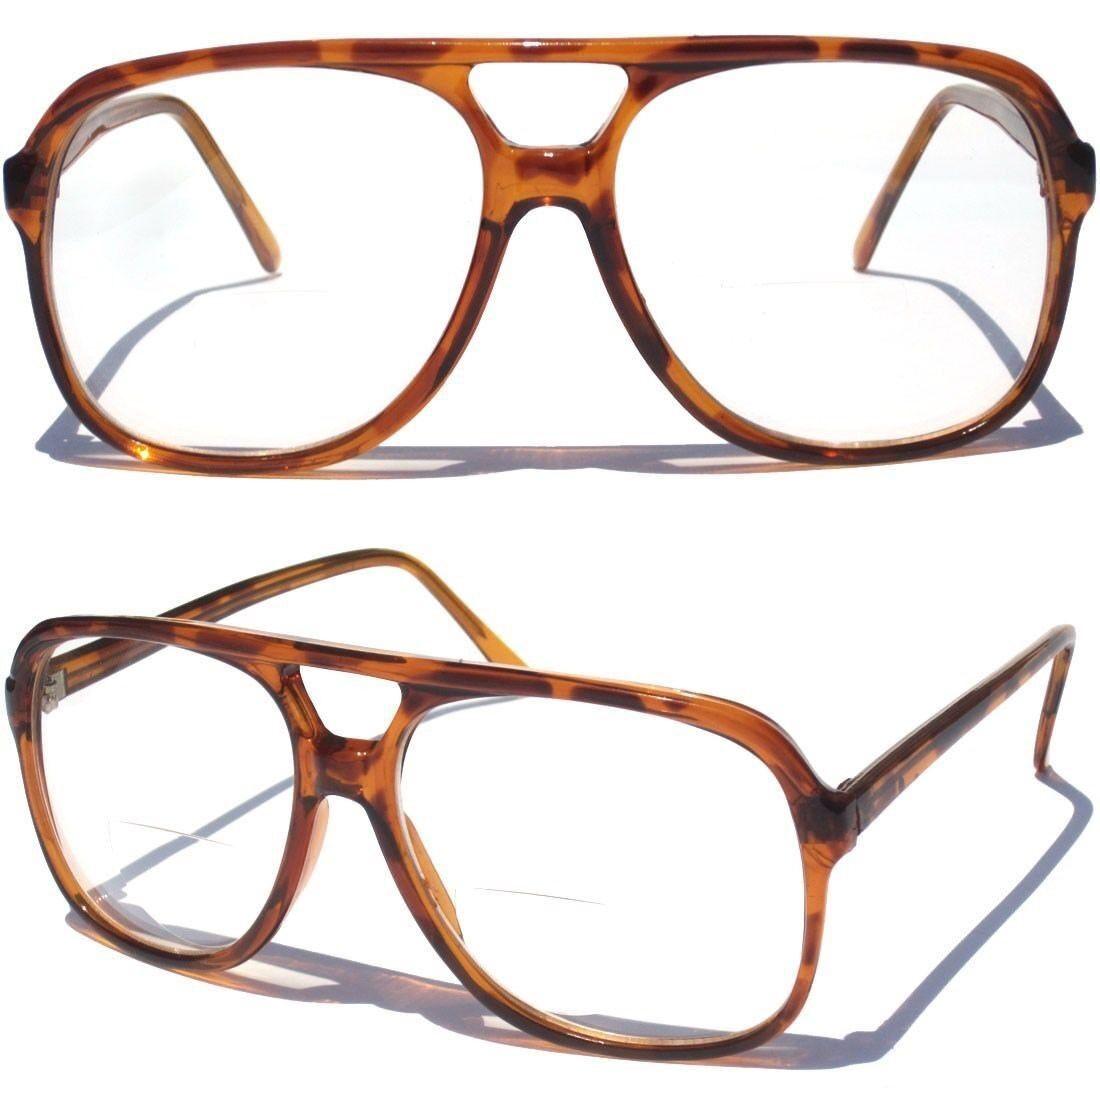 f6c82c94de0f Details about Large Aviator Bi-Focal Clear Lens Reading Glasses Tortoise  Shell Design Retro